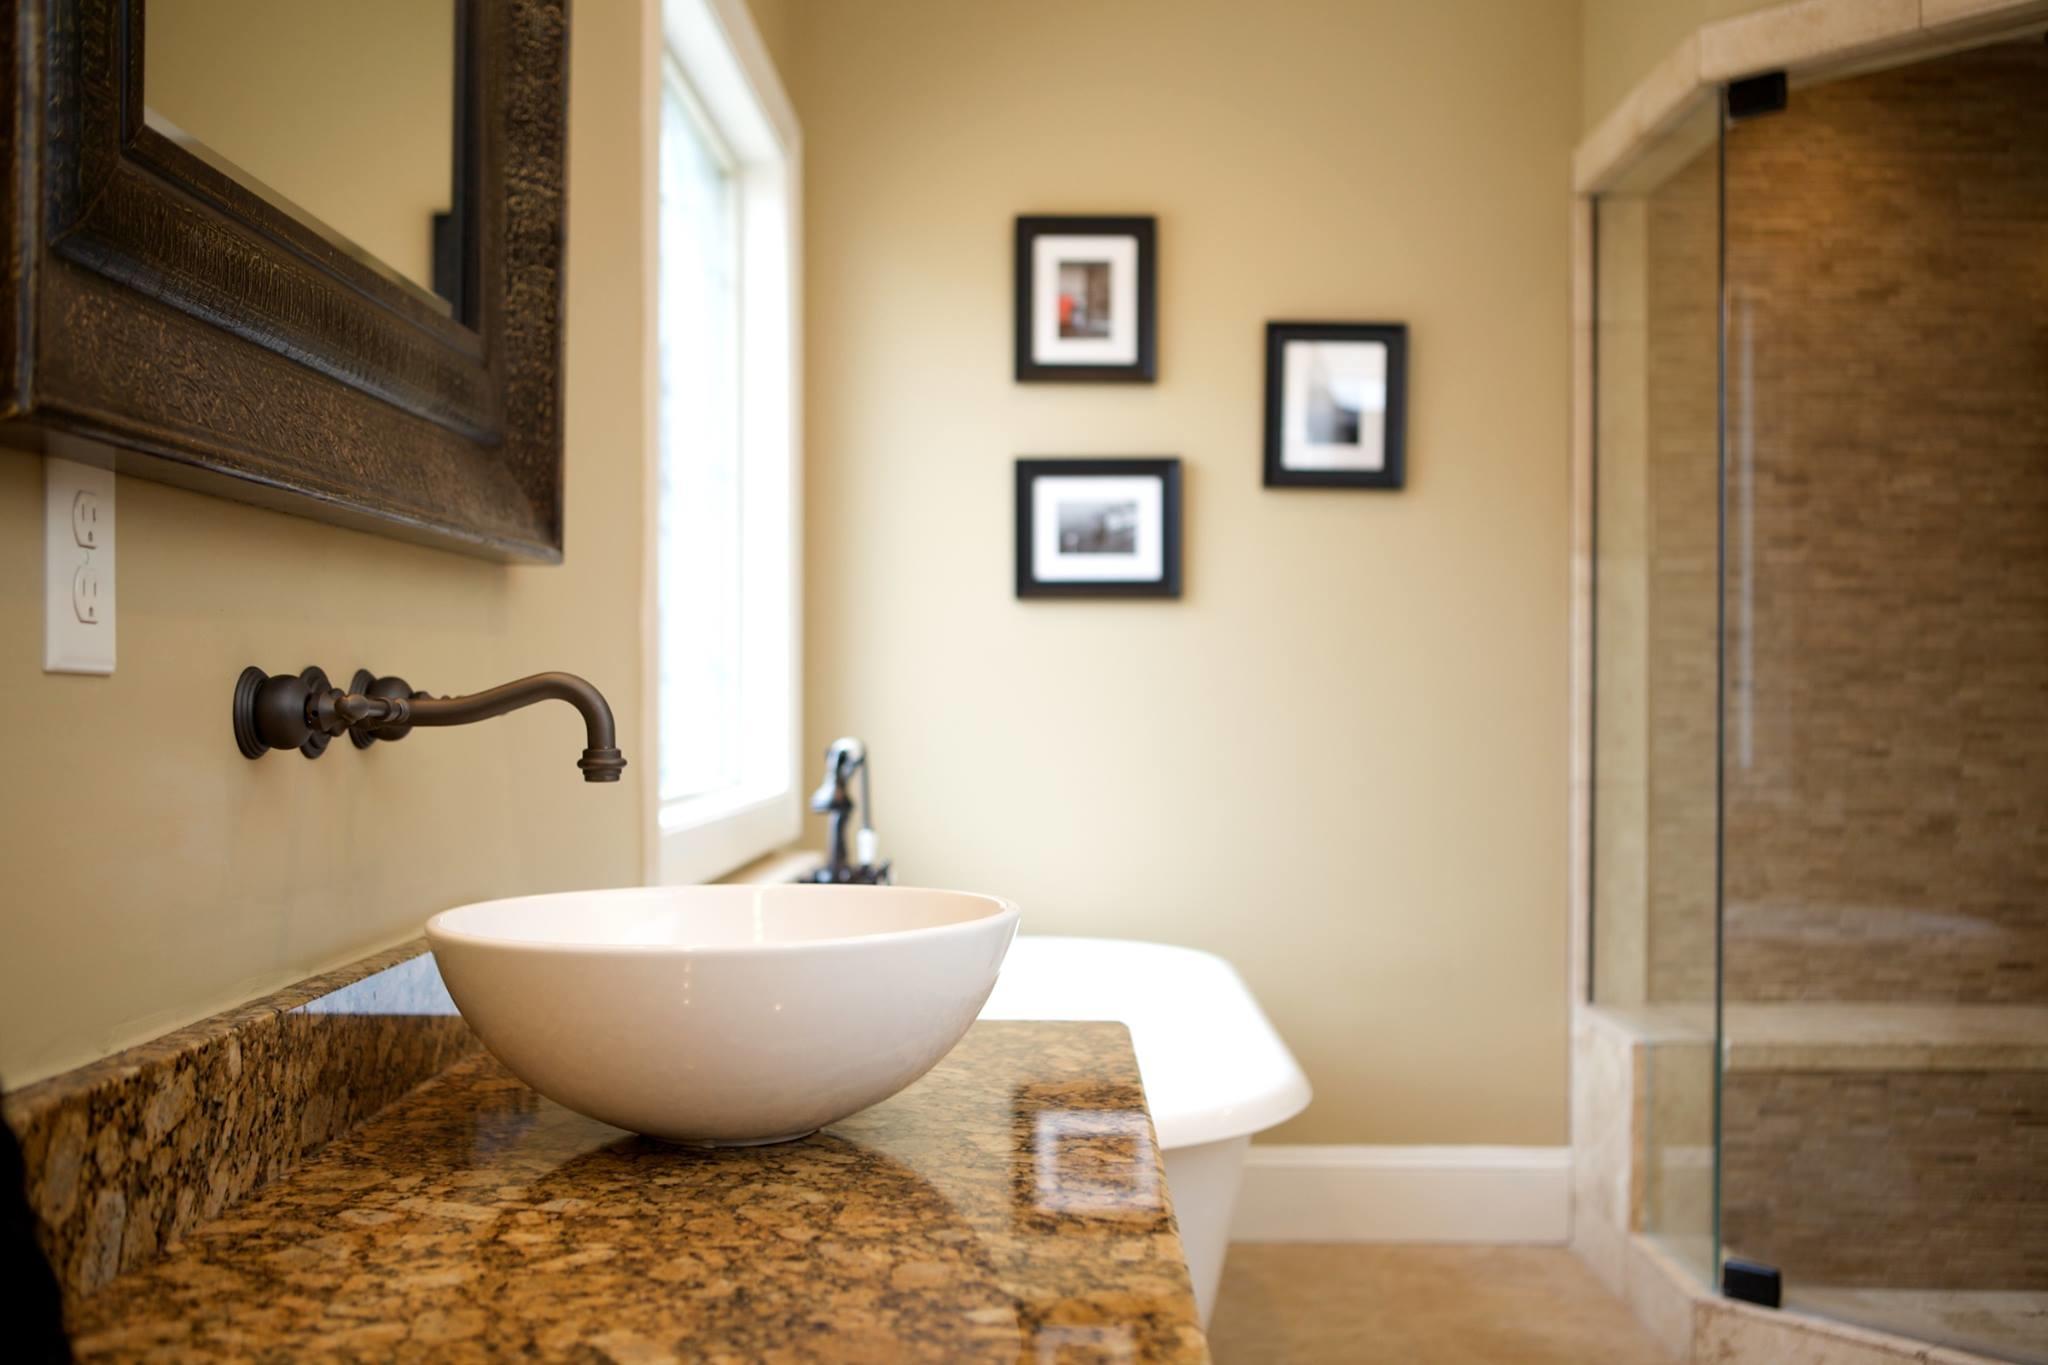 remodel graphy al case amp birmingham bathroom bath luxury of remodeling design